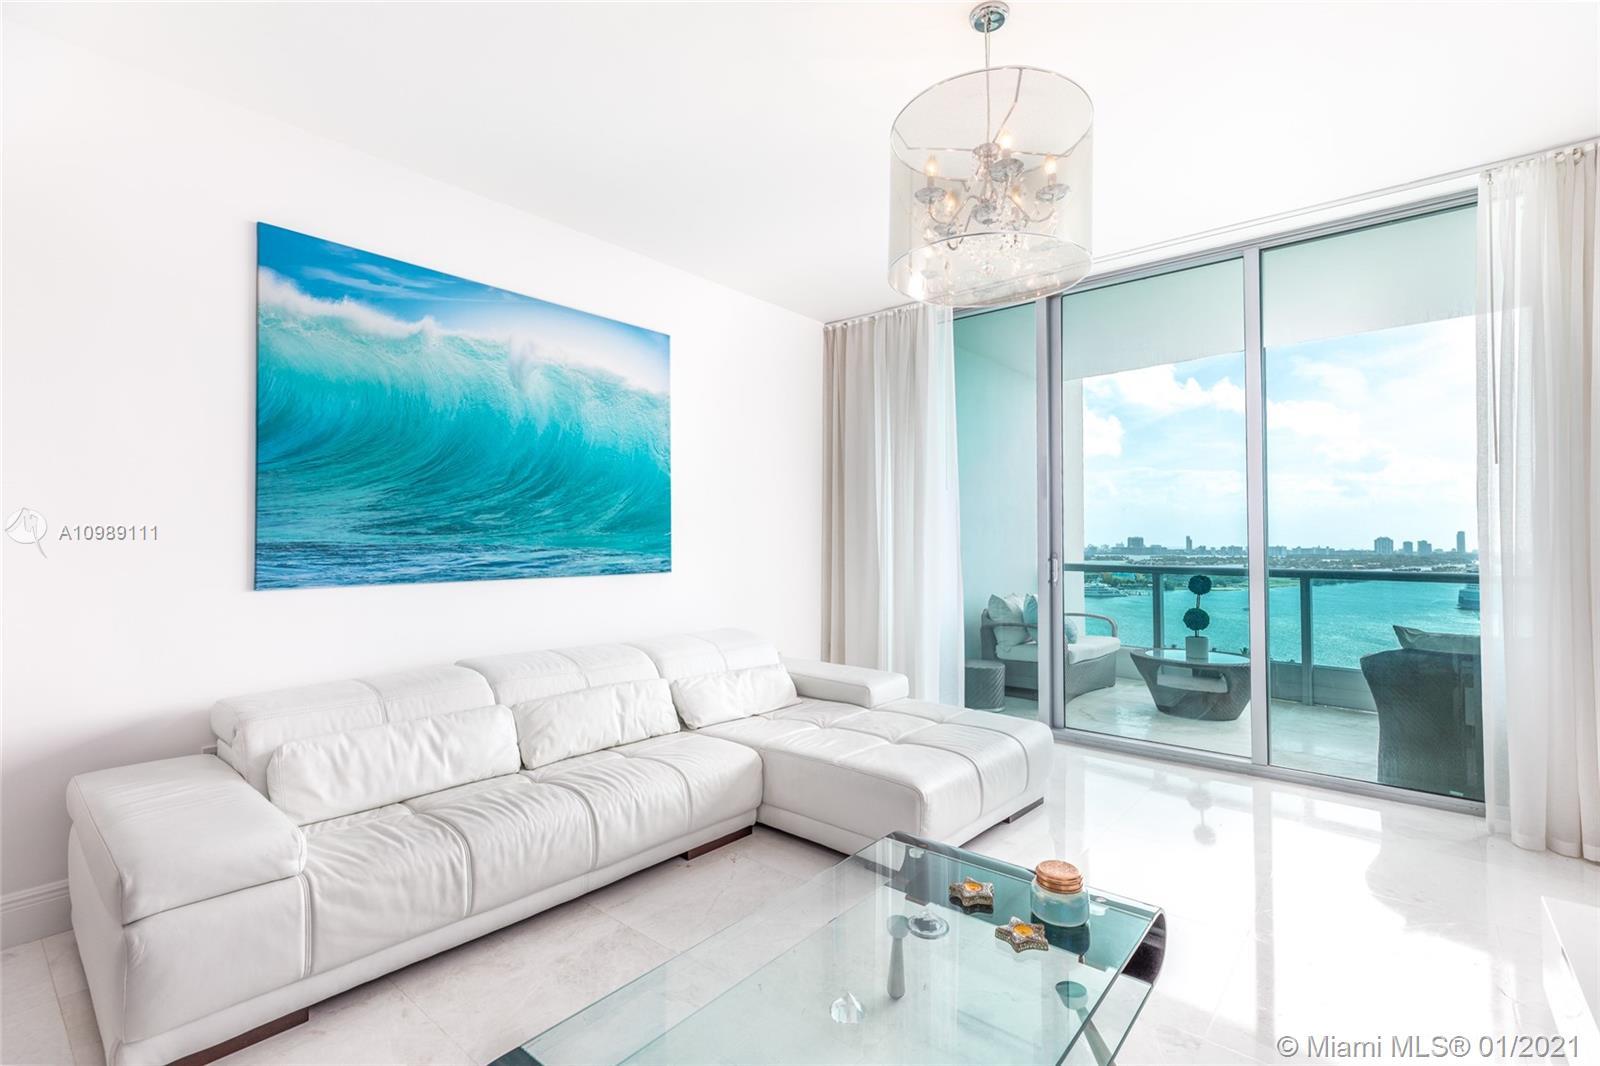 900 Biscayne Bay #2502 - 900 NE Biscayne Blvd #2502, Miami, FL 33132